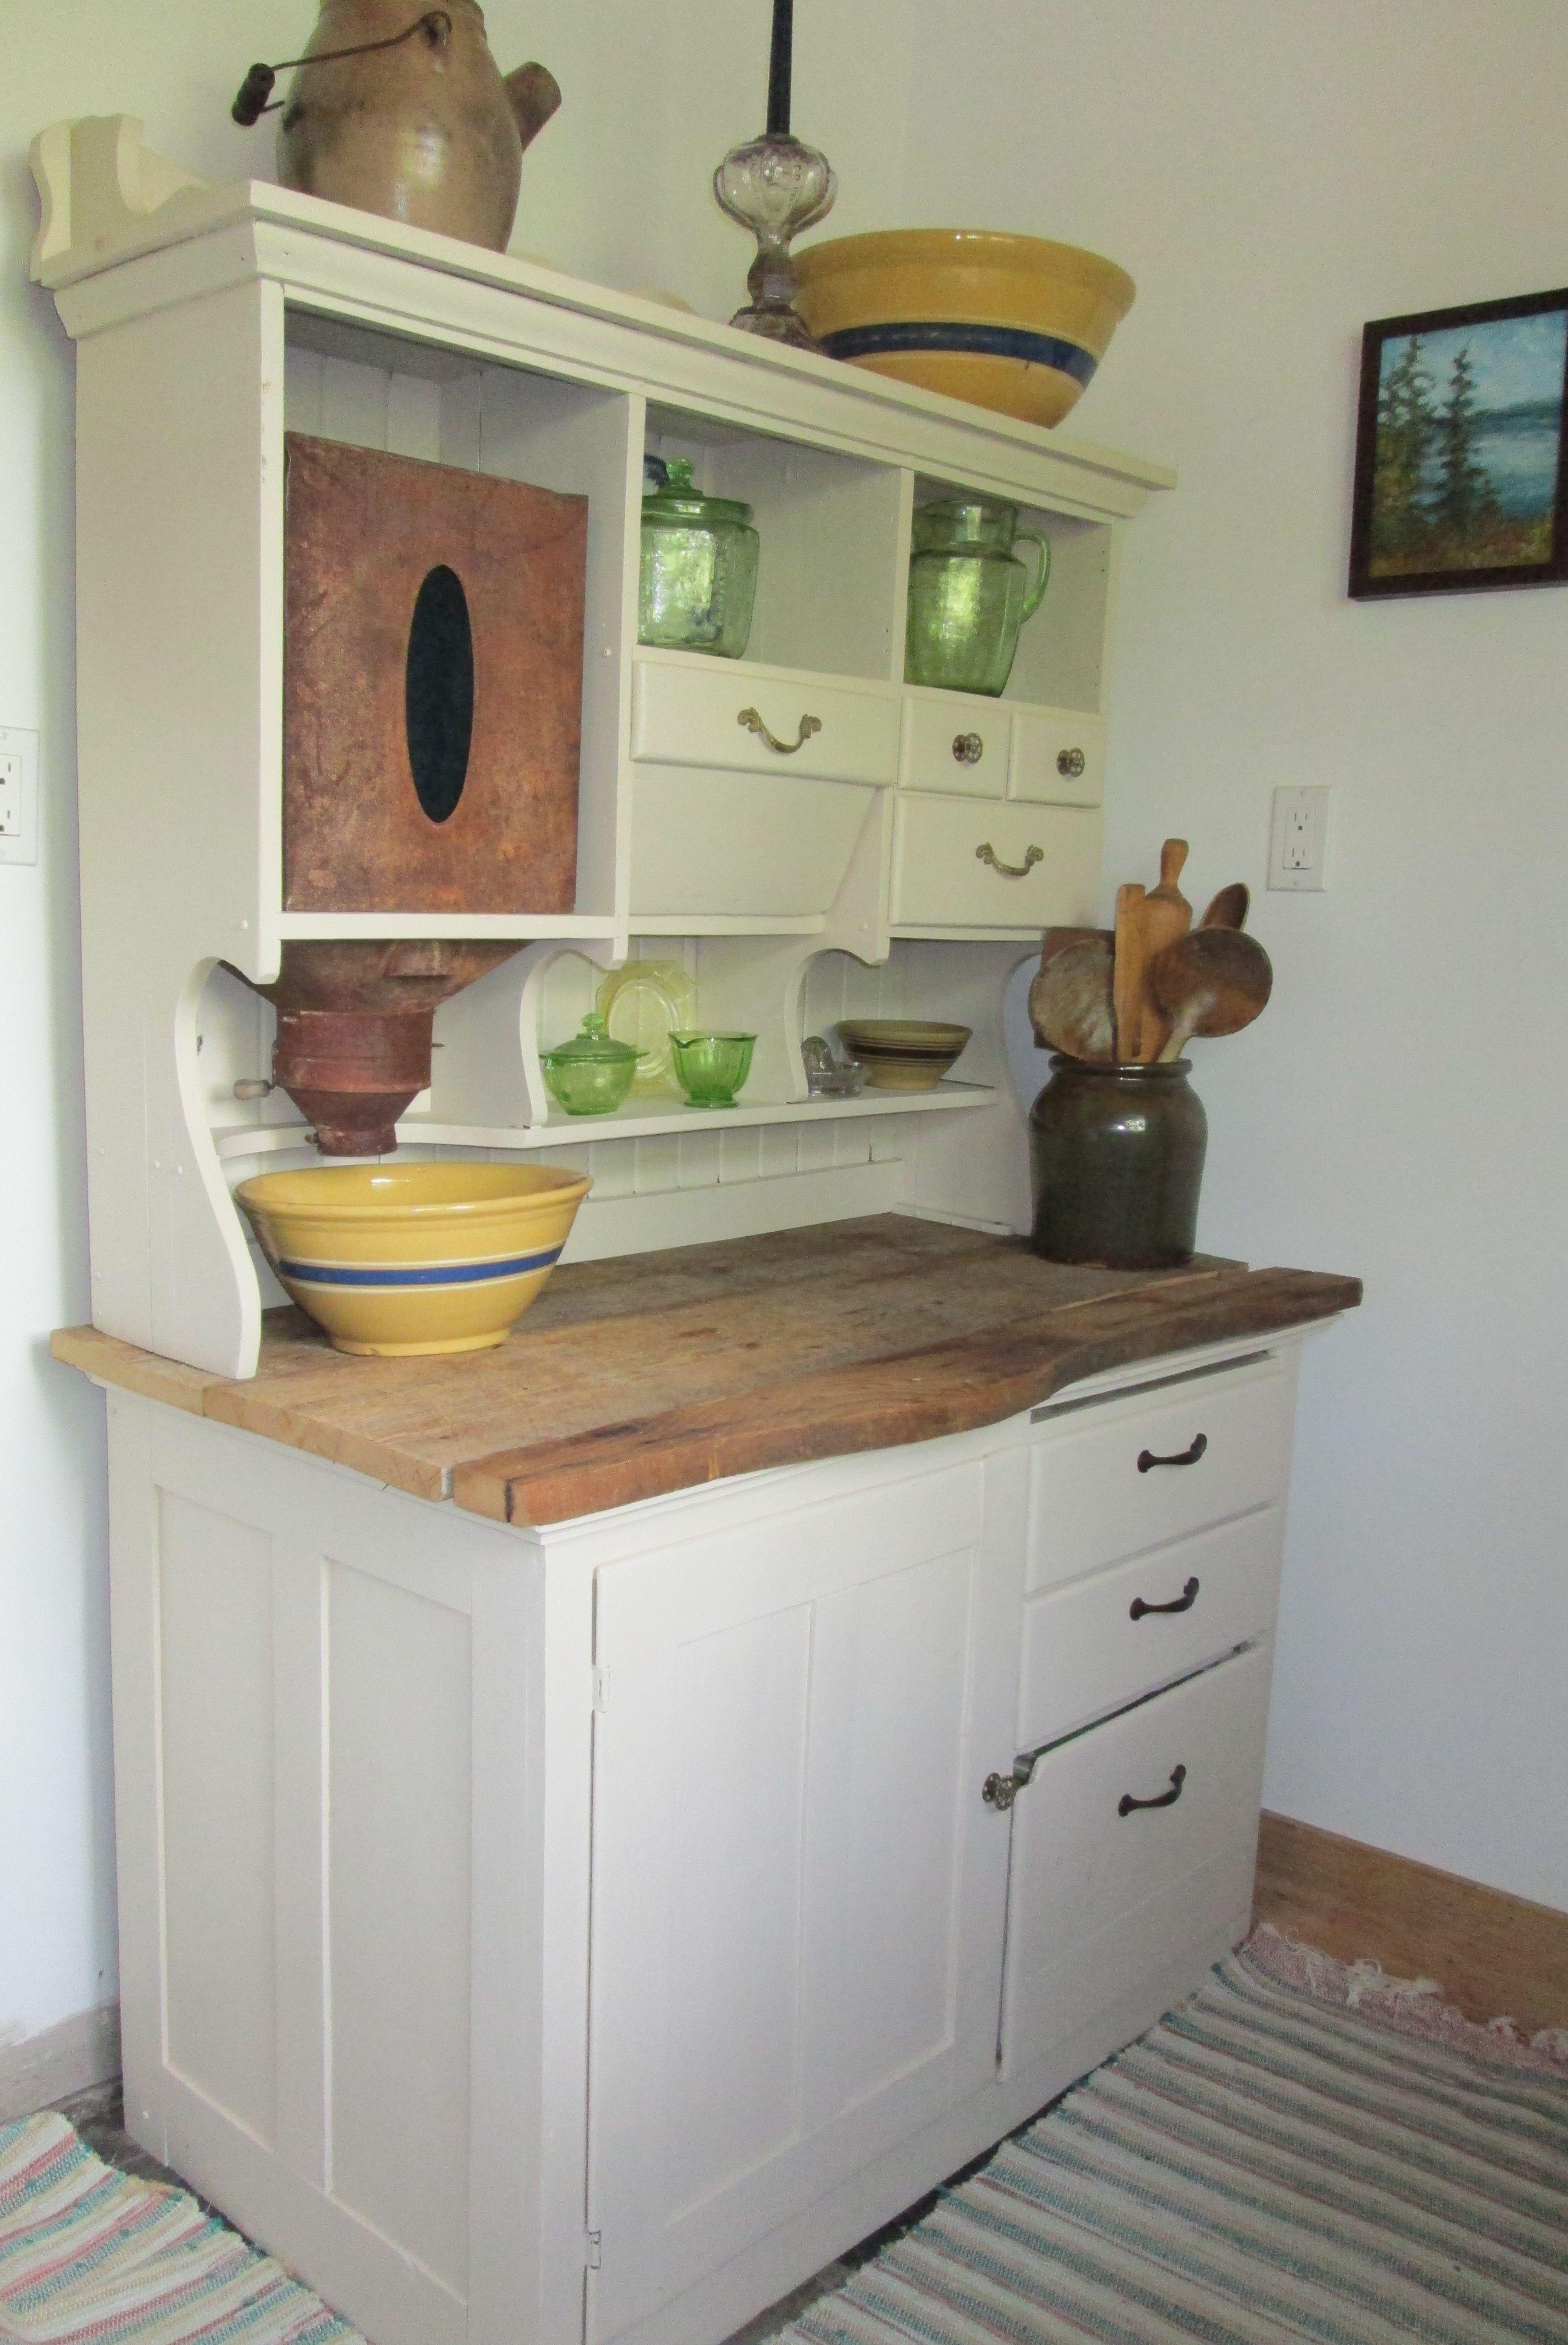 bradley interior copya carnations wp eagle cottage incarnations design lake in cottages foyer cupboard